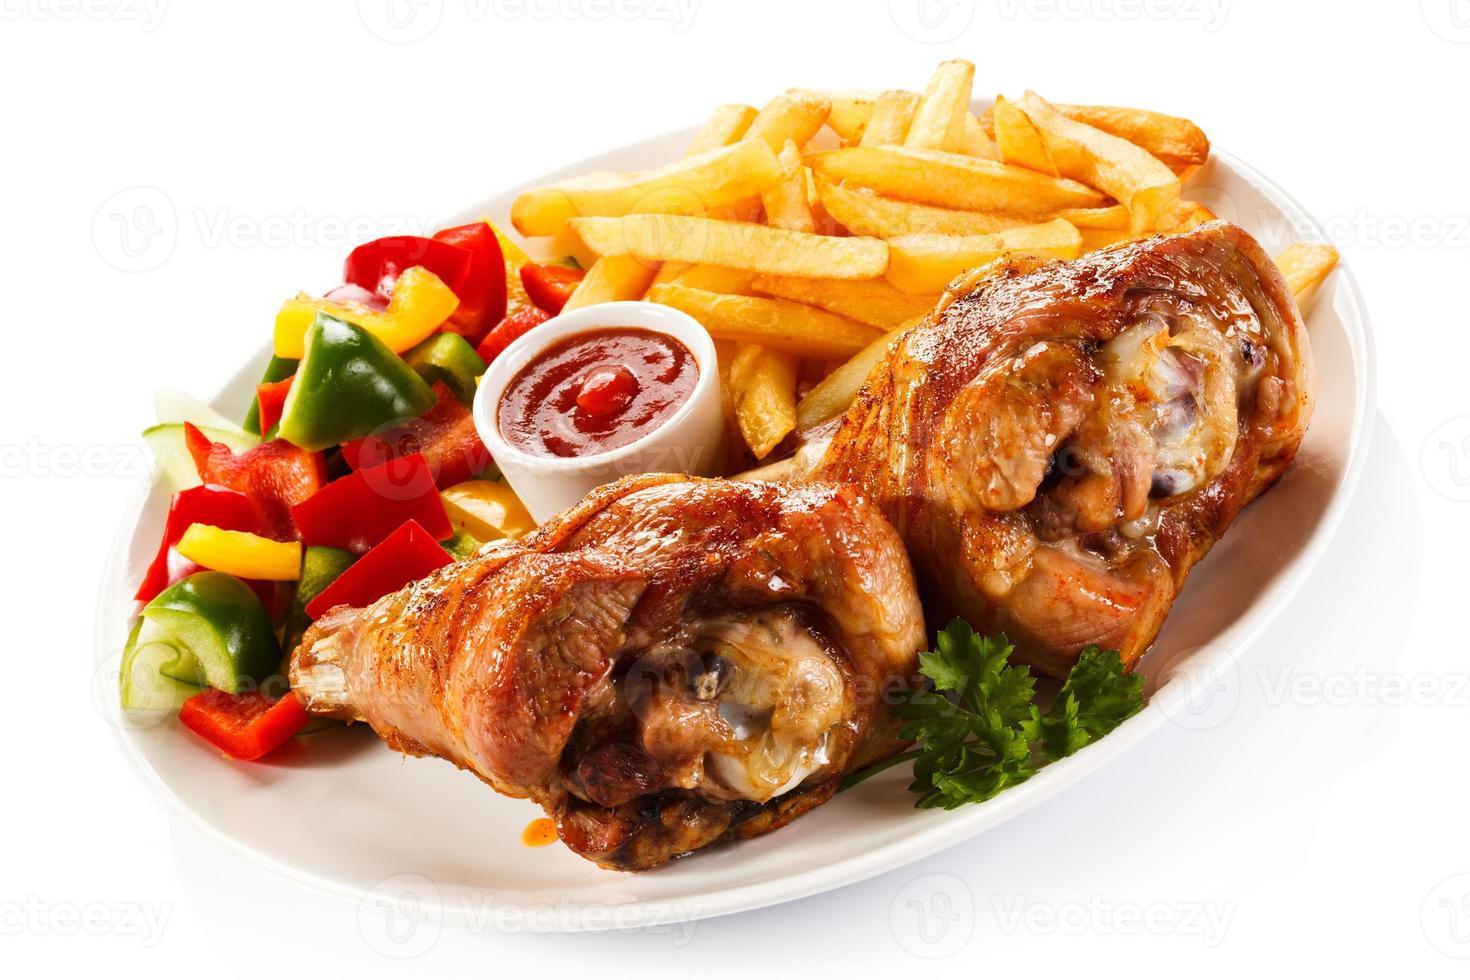 geroosterde kalkoen dij, frietjes en groenten foto